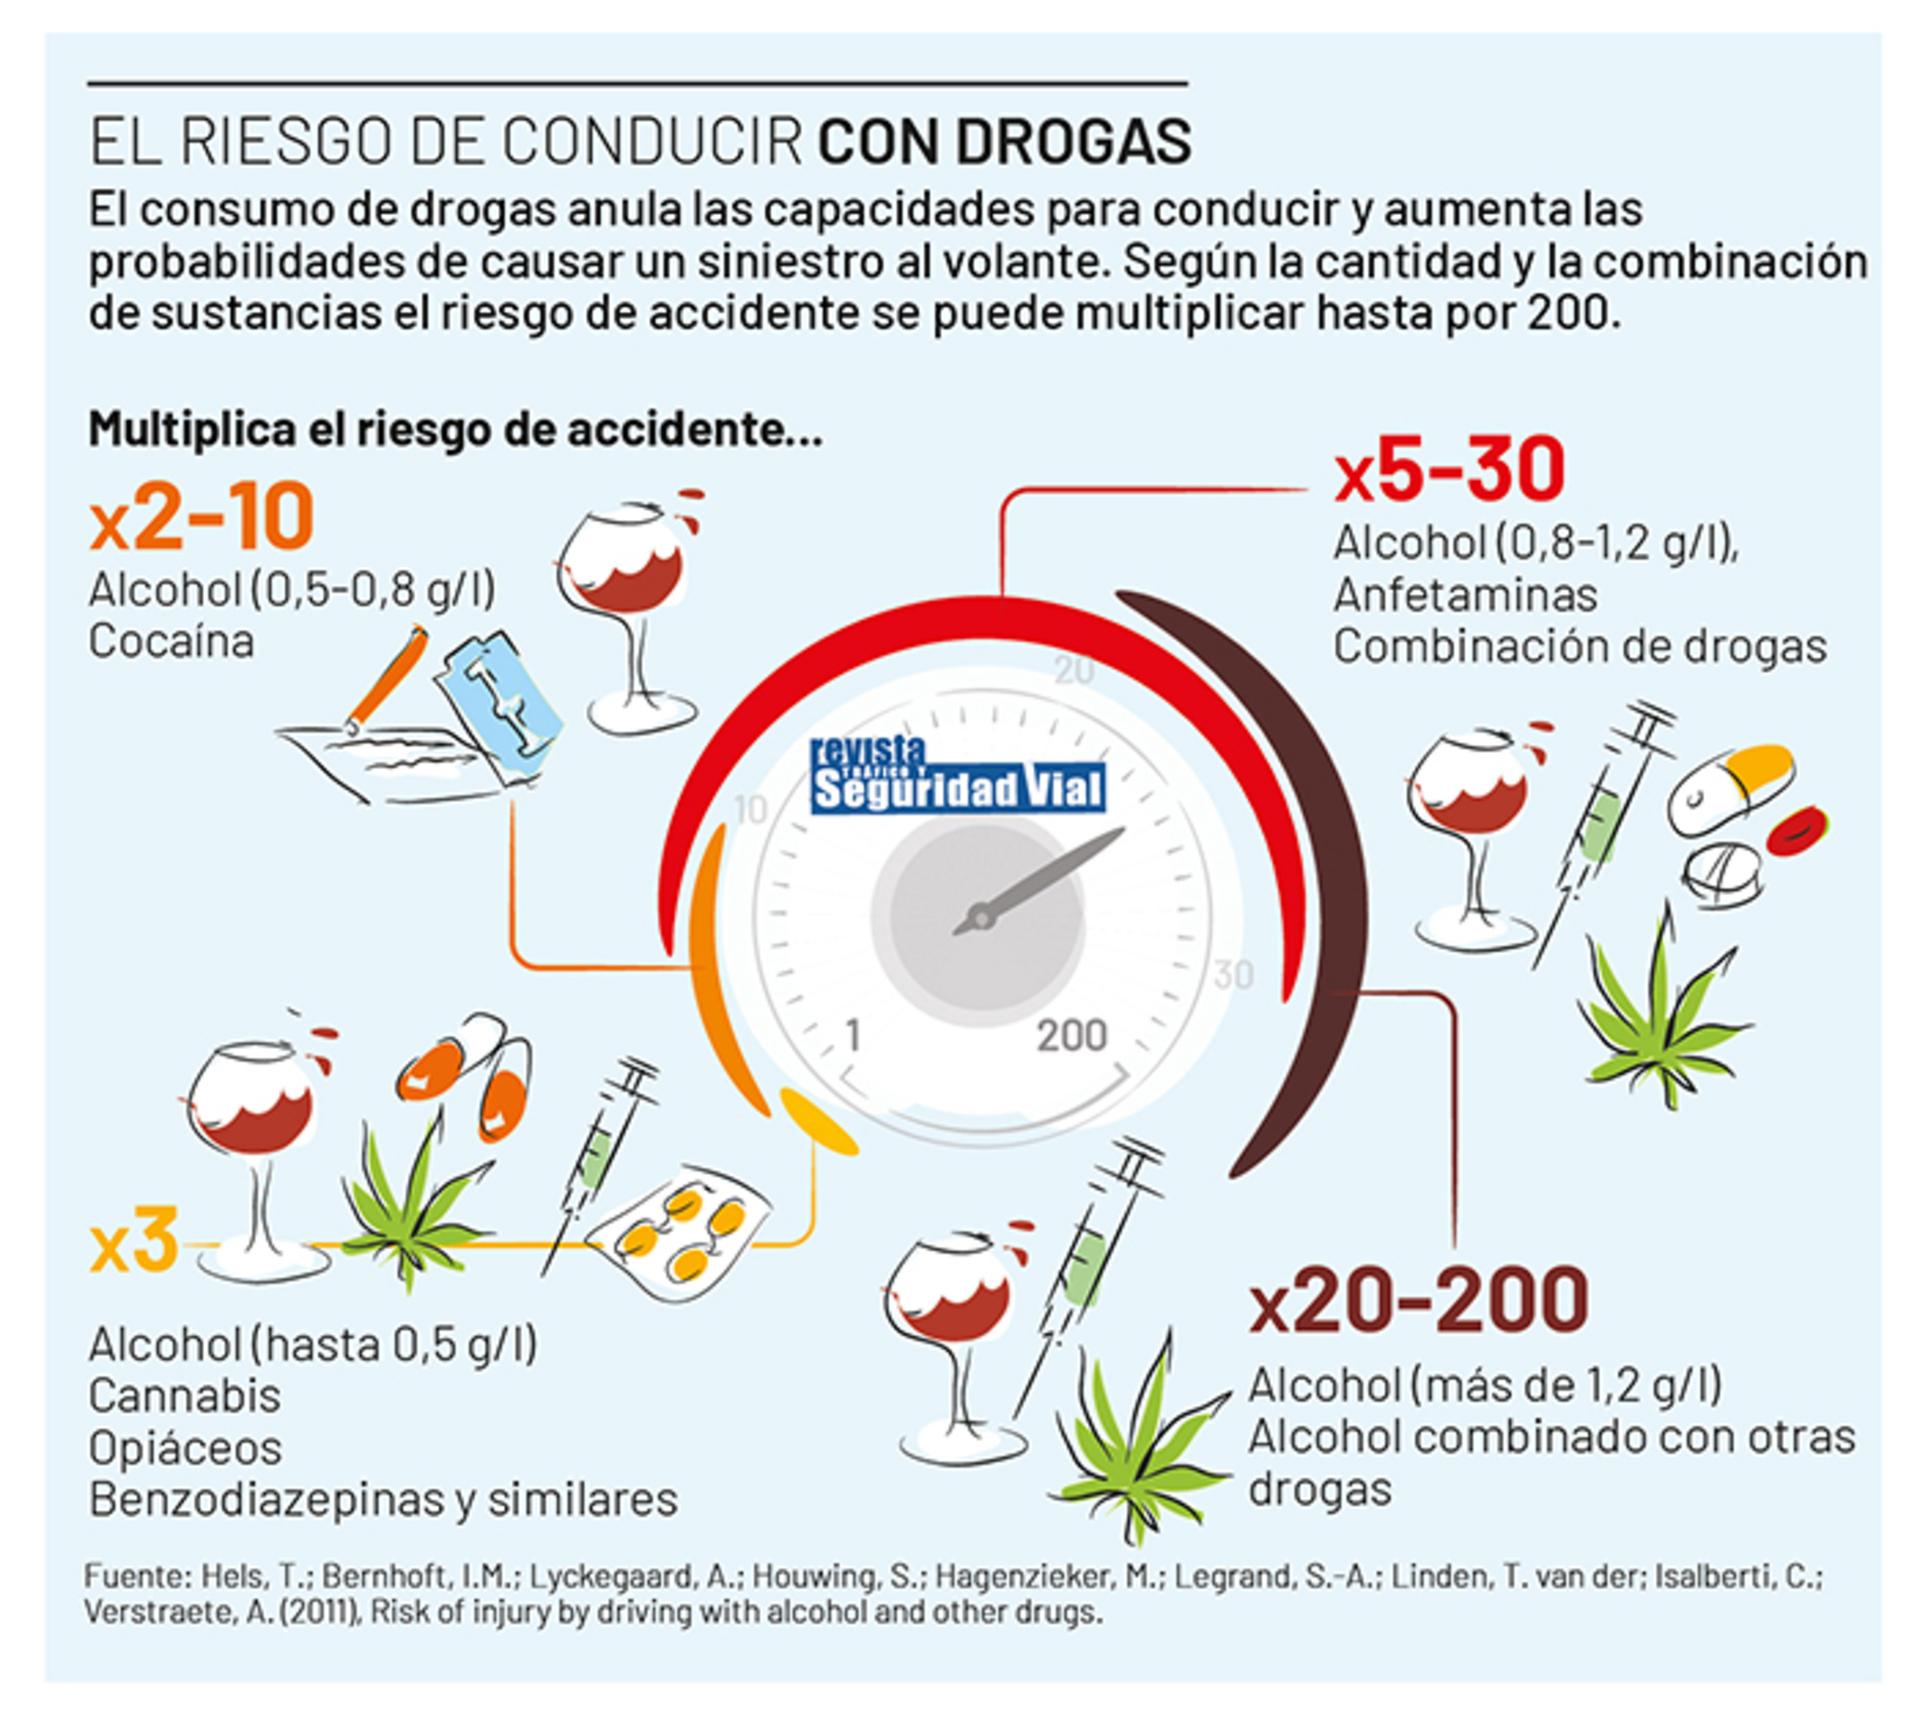 Infografia Riesgo Conducir Con Drogas